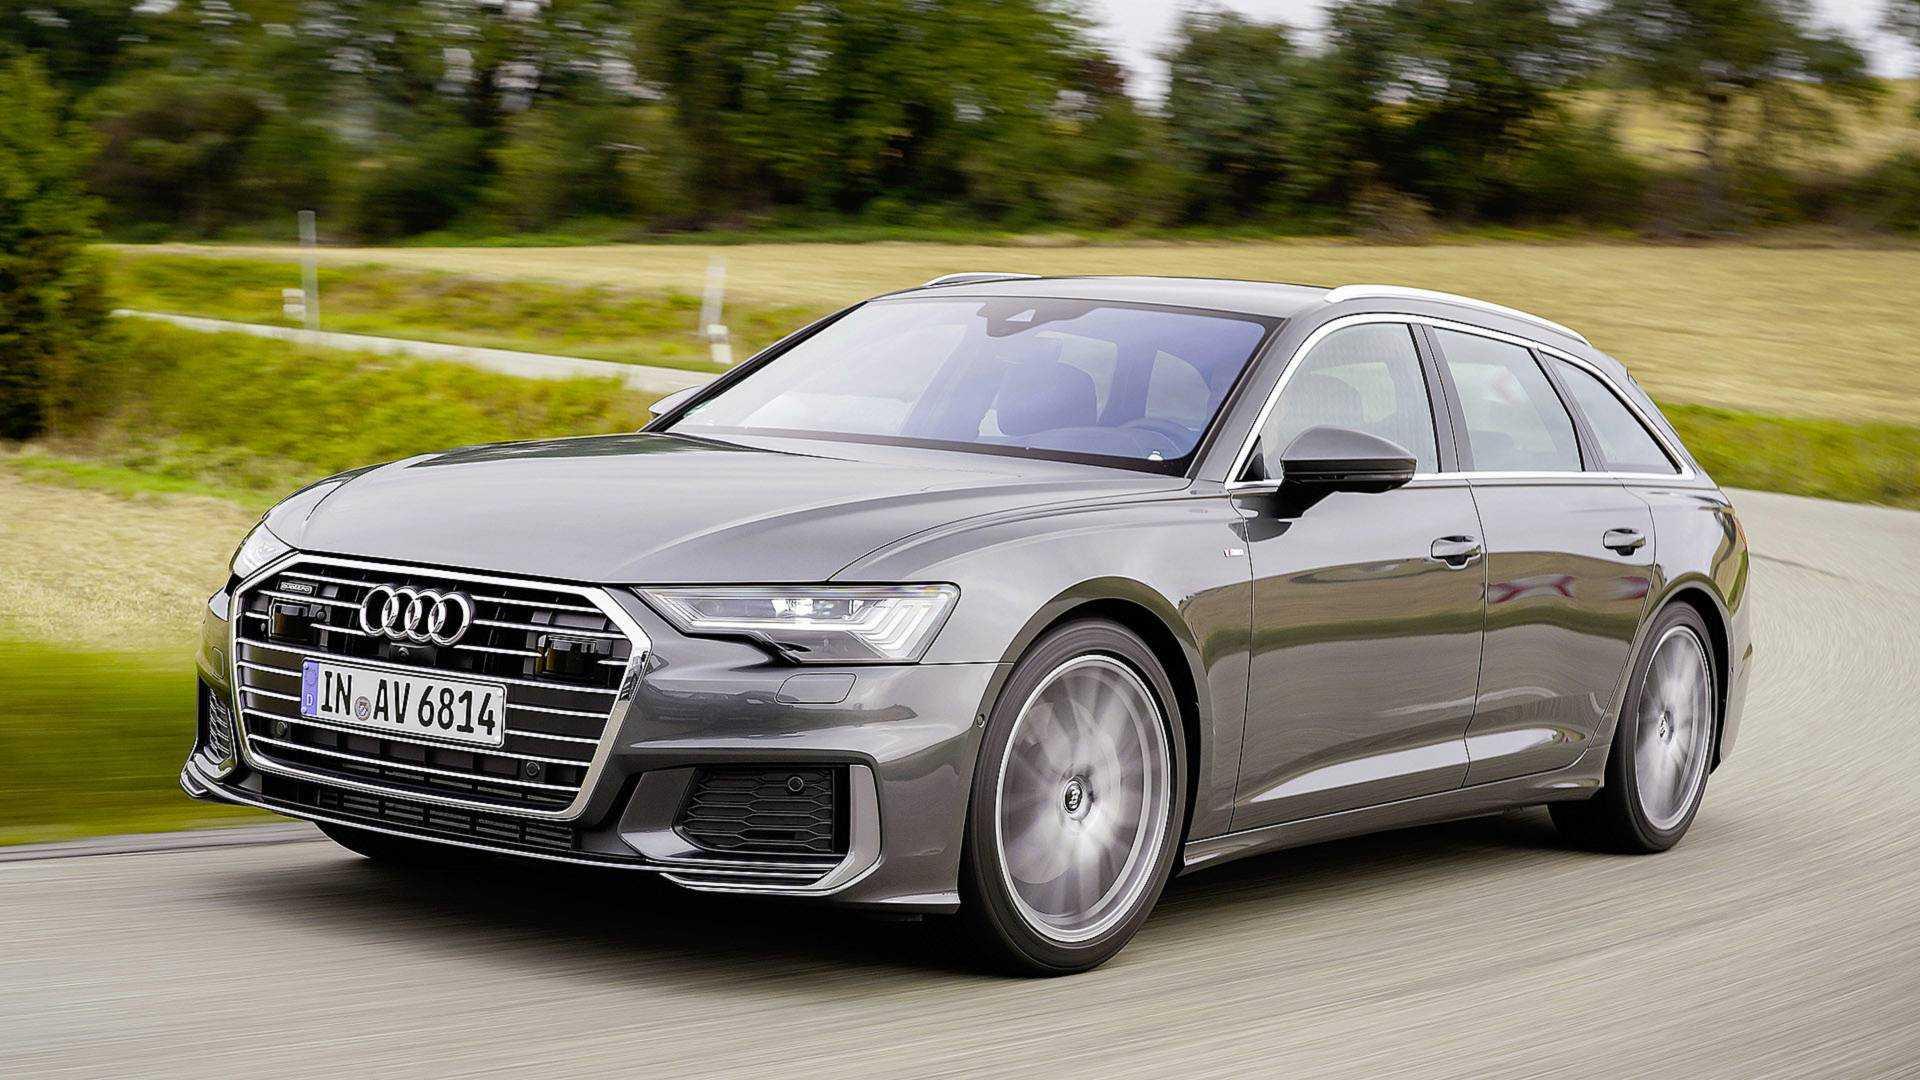 Kekurangan A6 Audi 2019 Top Model Tahun Ini